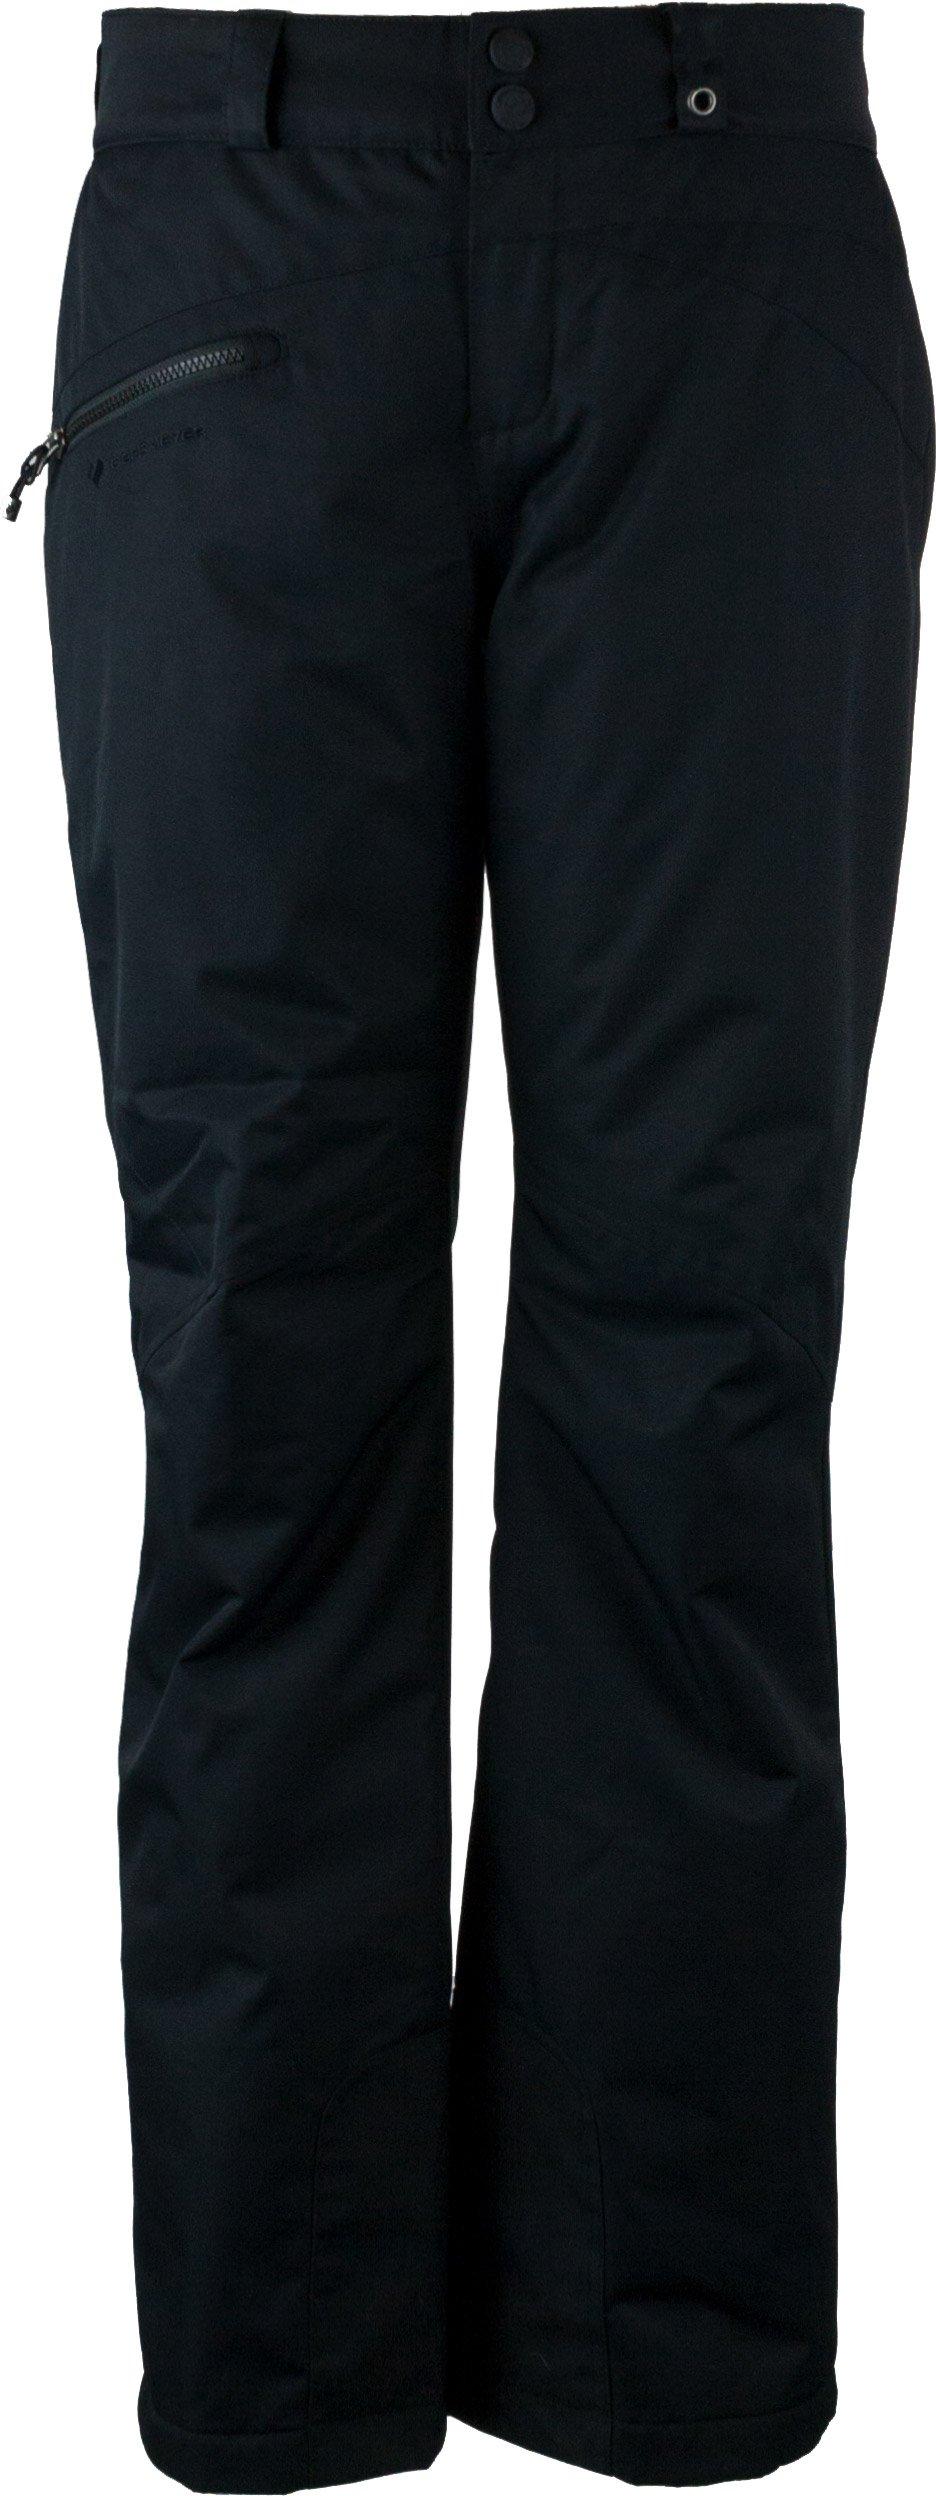 Obermeyer Women's Malta Pants Black 4